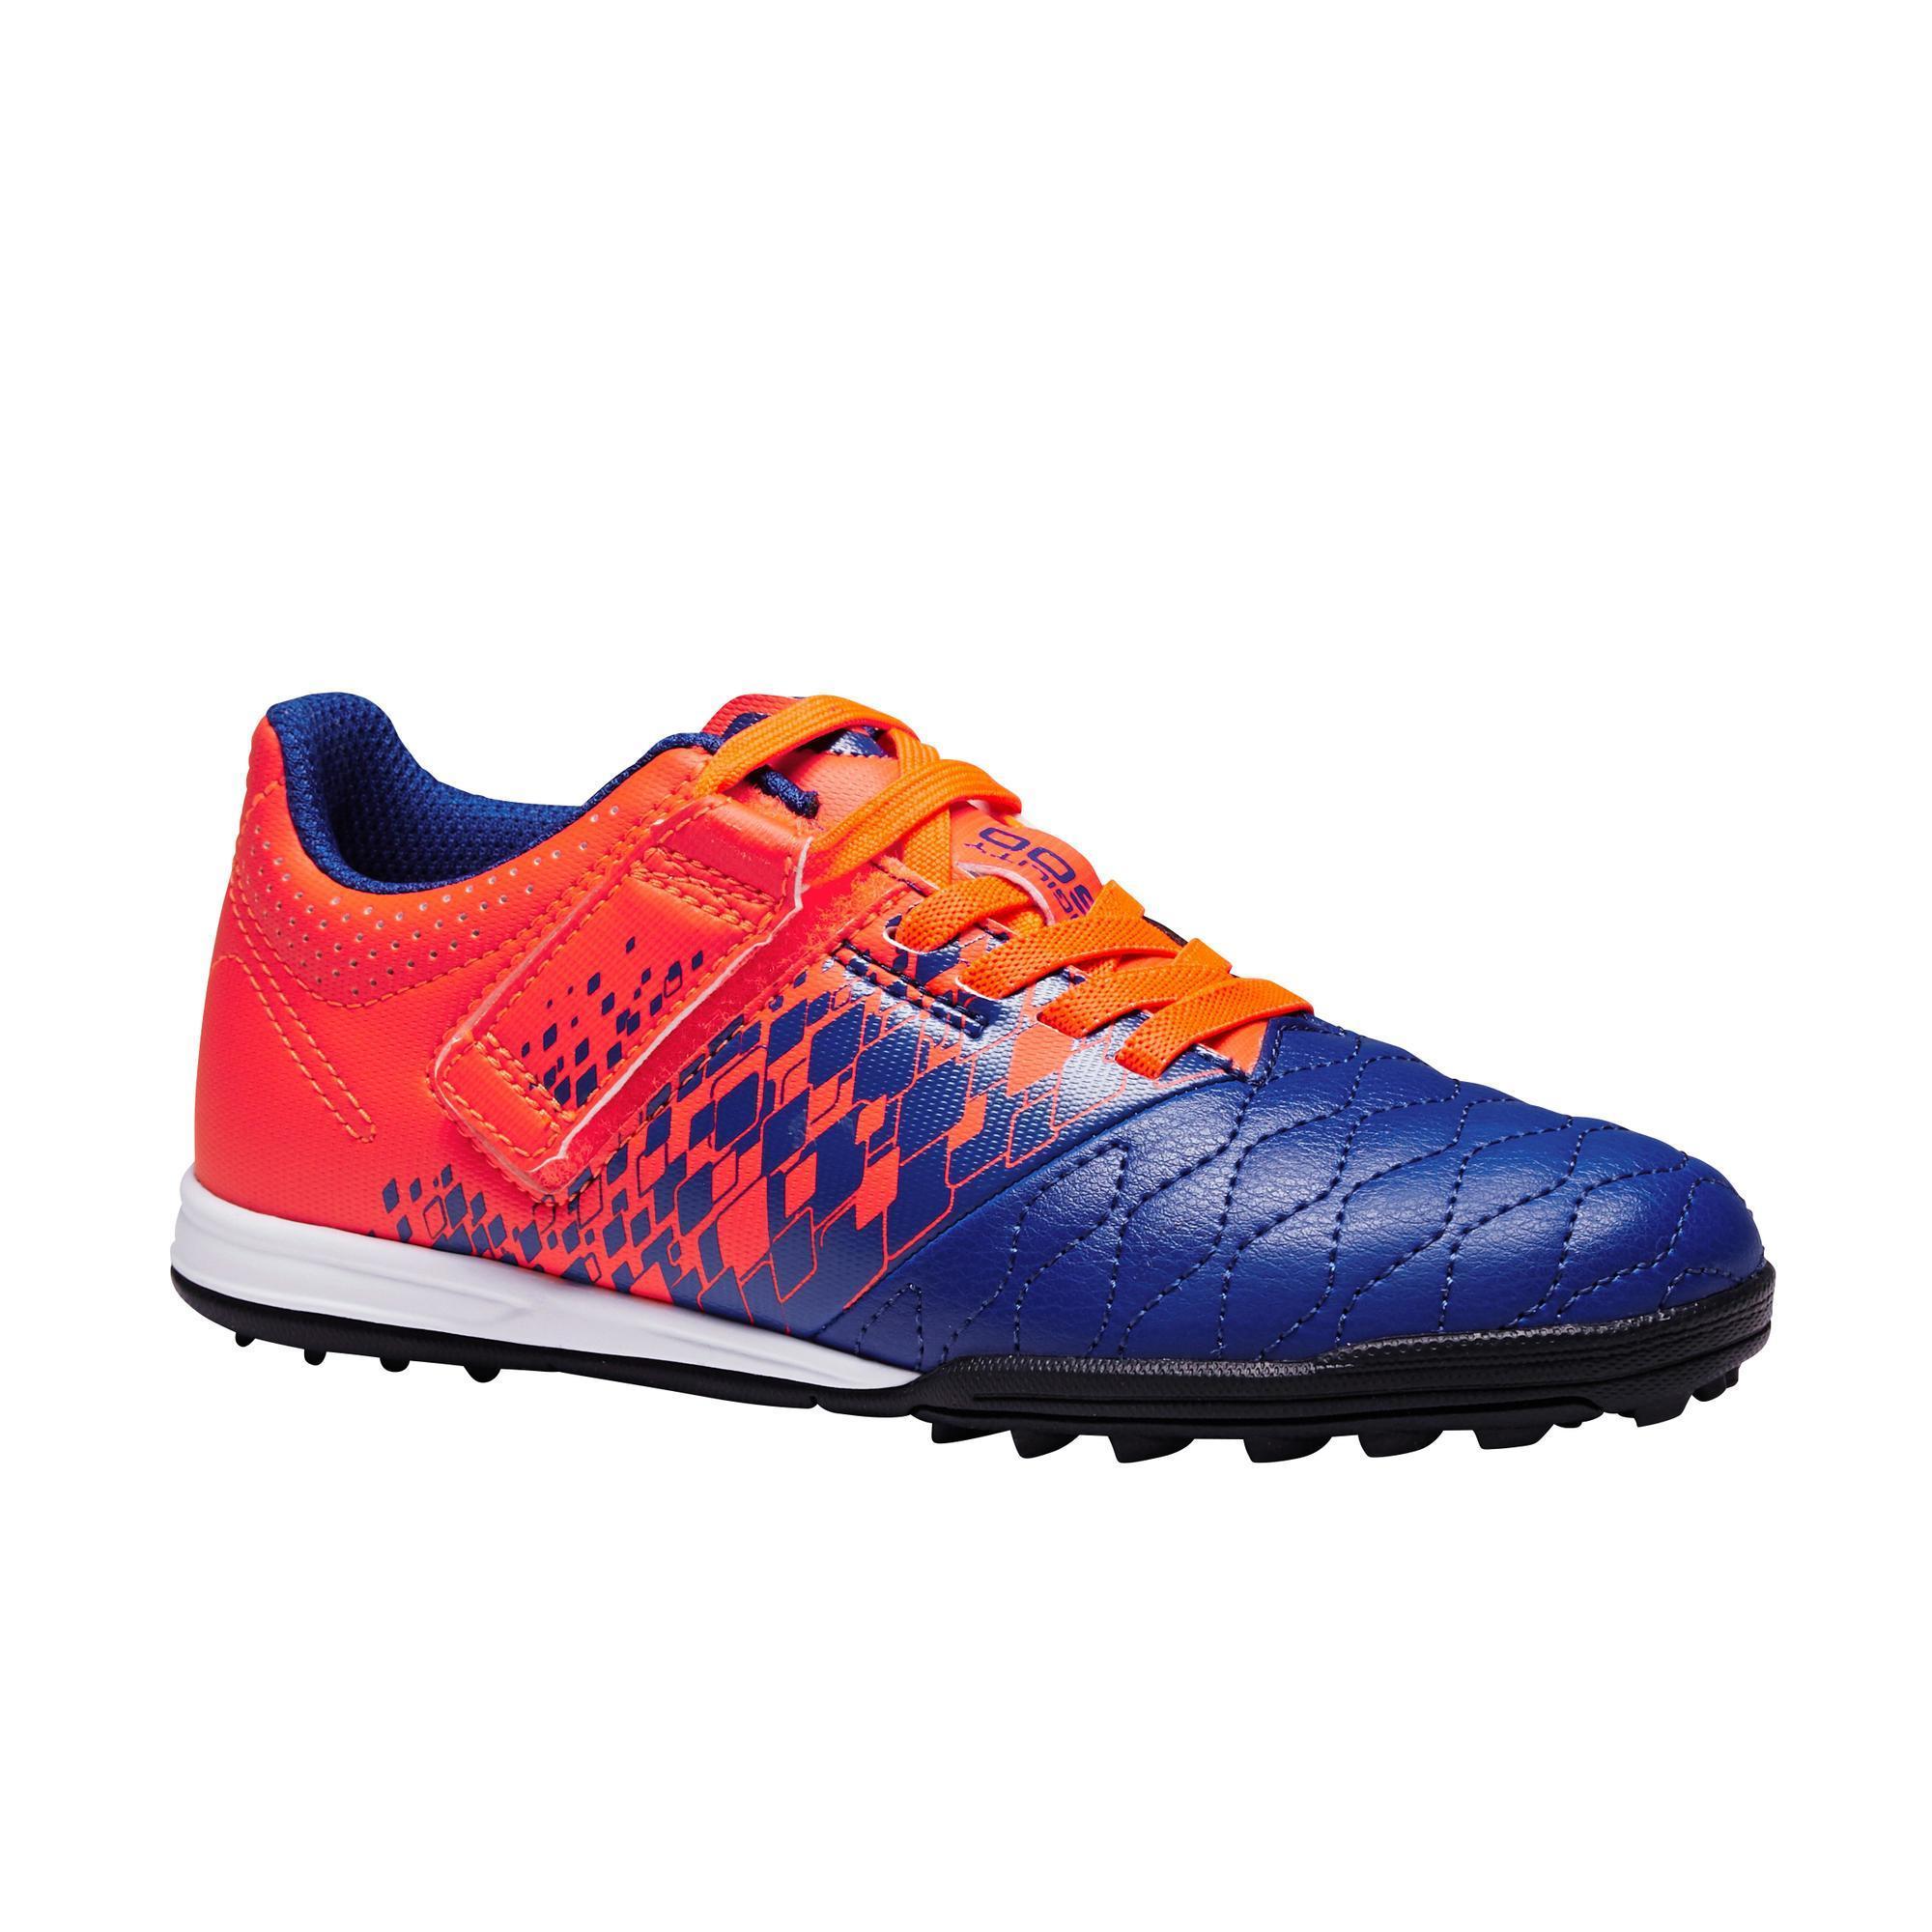 Kipsta Voetbalschoenen kind Agility 500 HG klittenband blauw/oranje